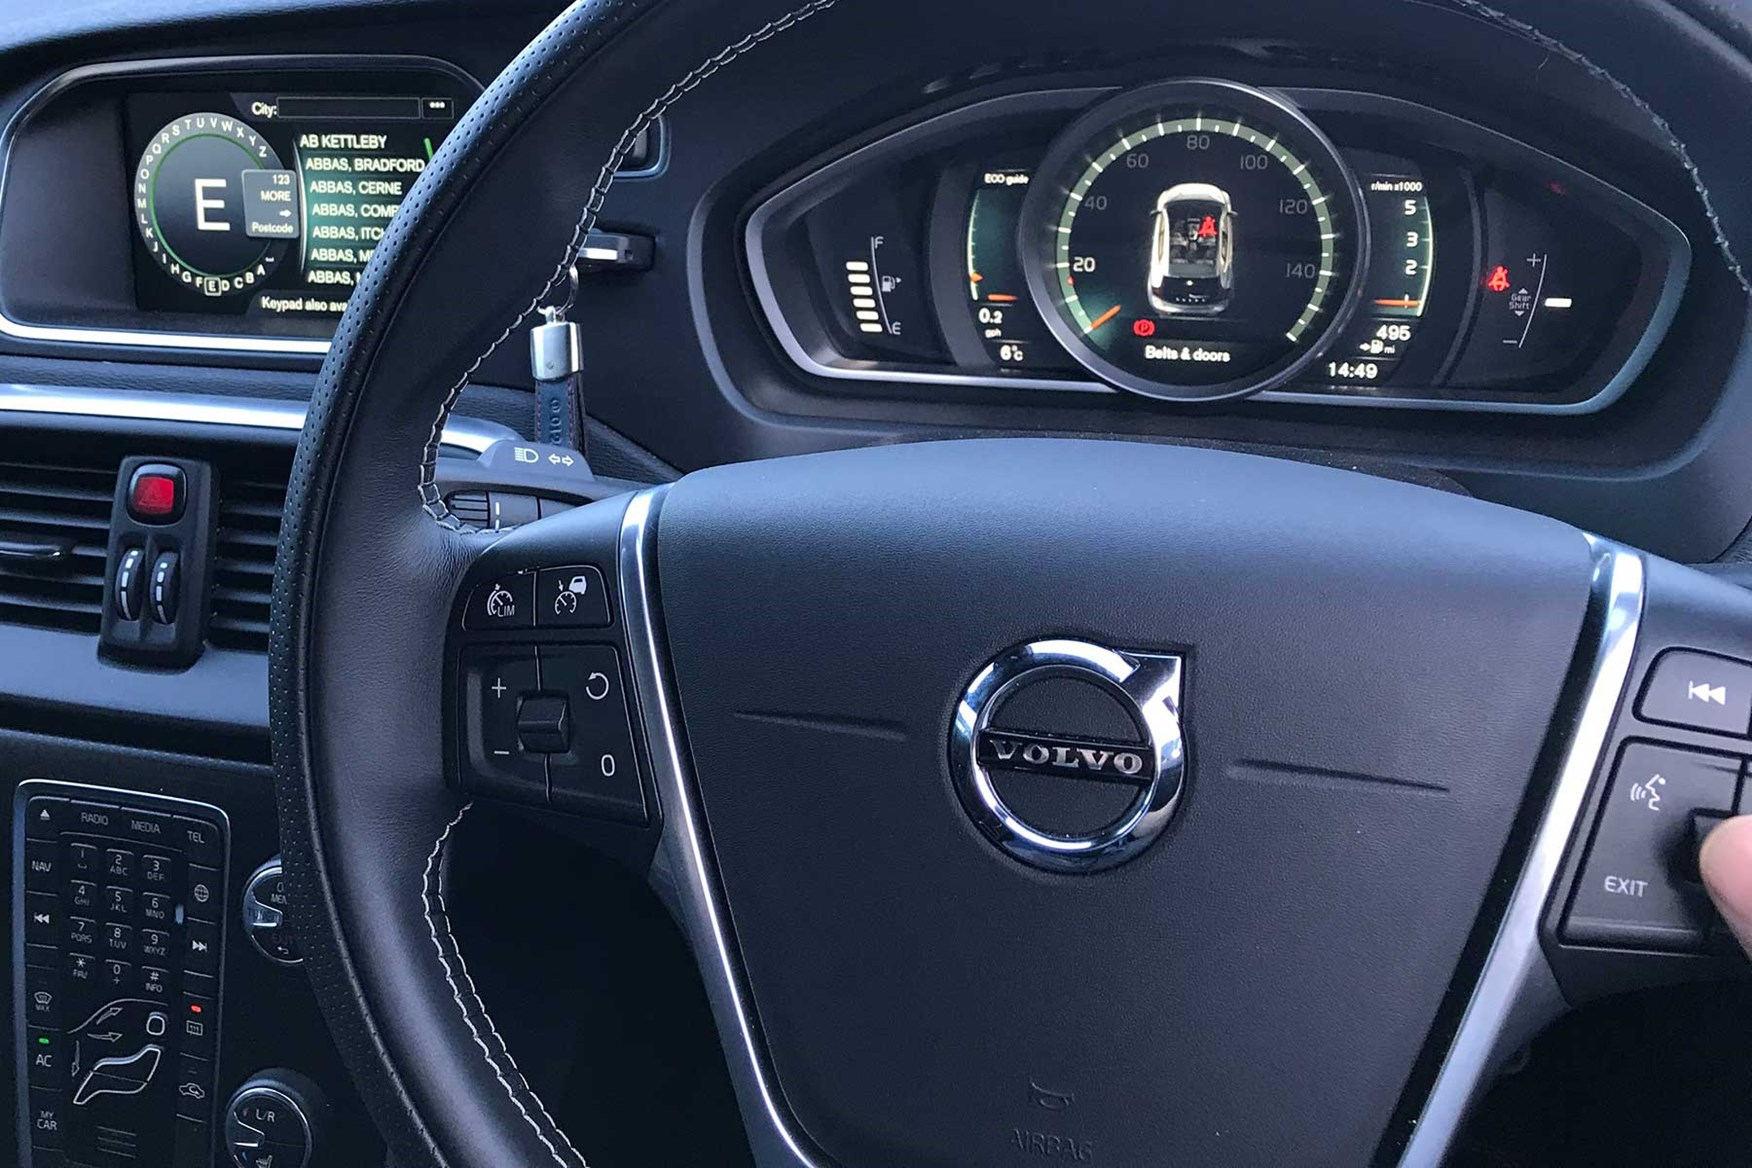 Volvo V40 steering wheel control